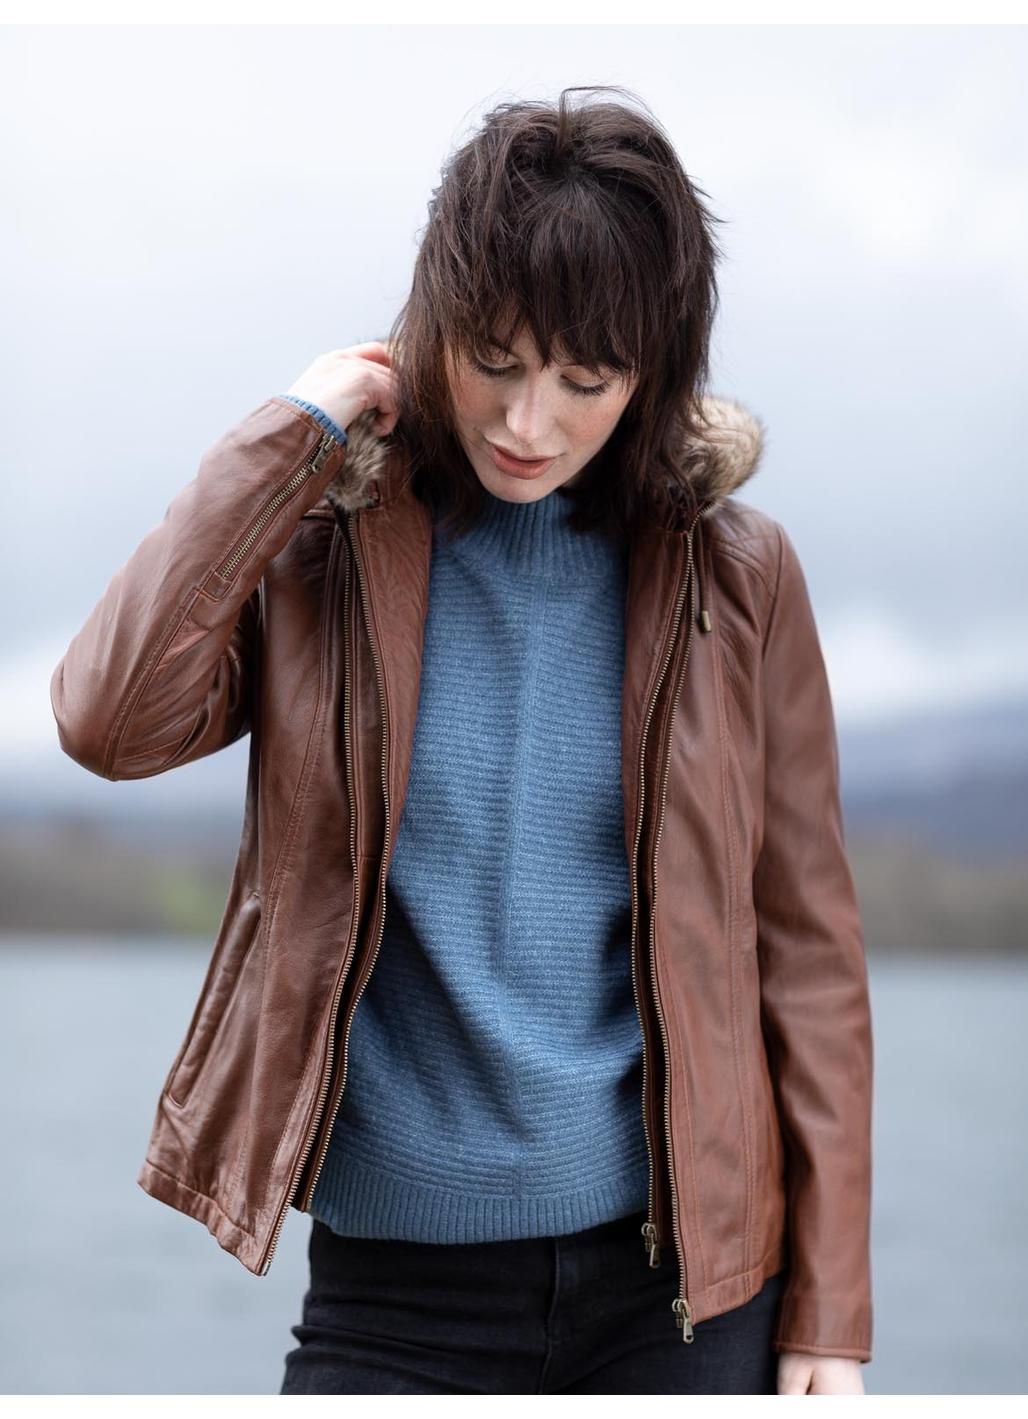 Applethwaite Hooded Leather Jacket in Cognac